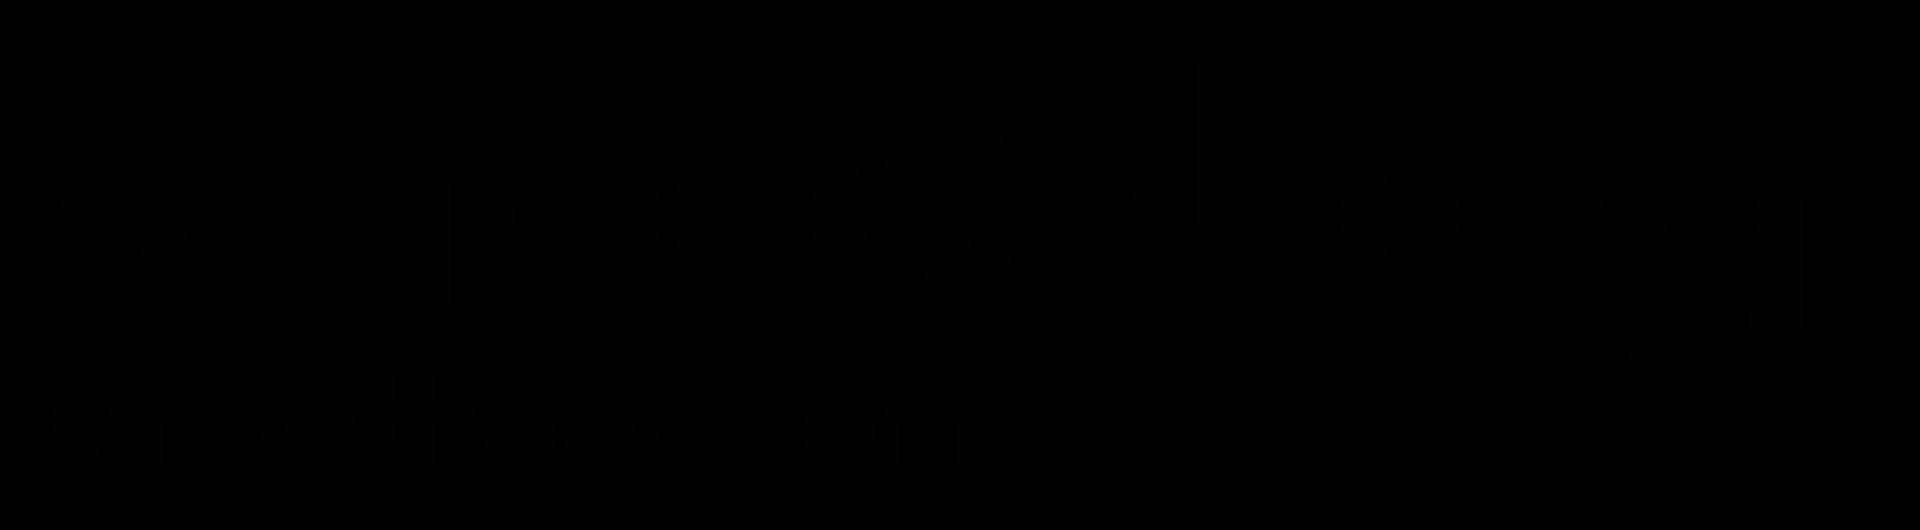 Smoothbag logo